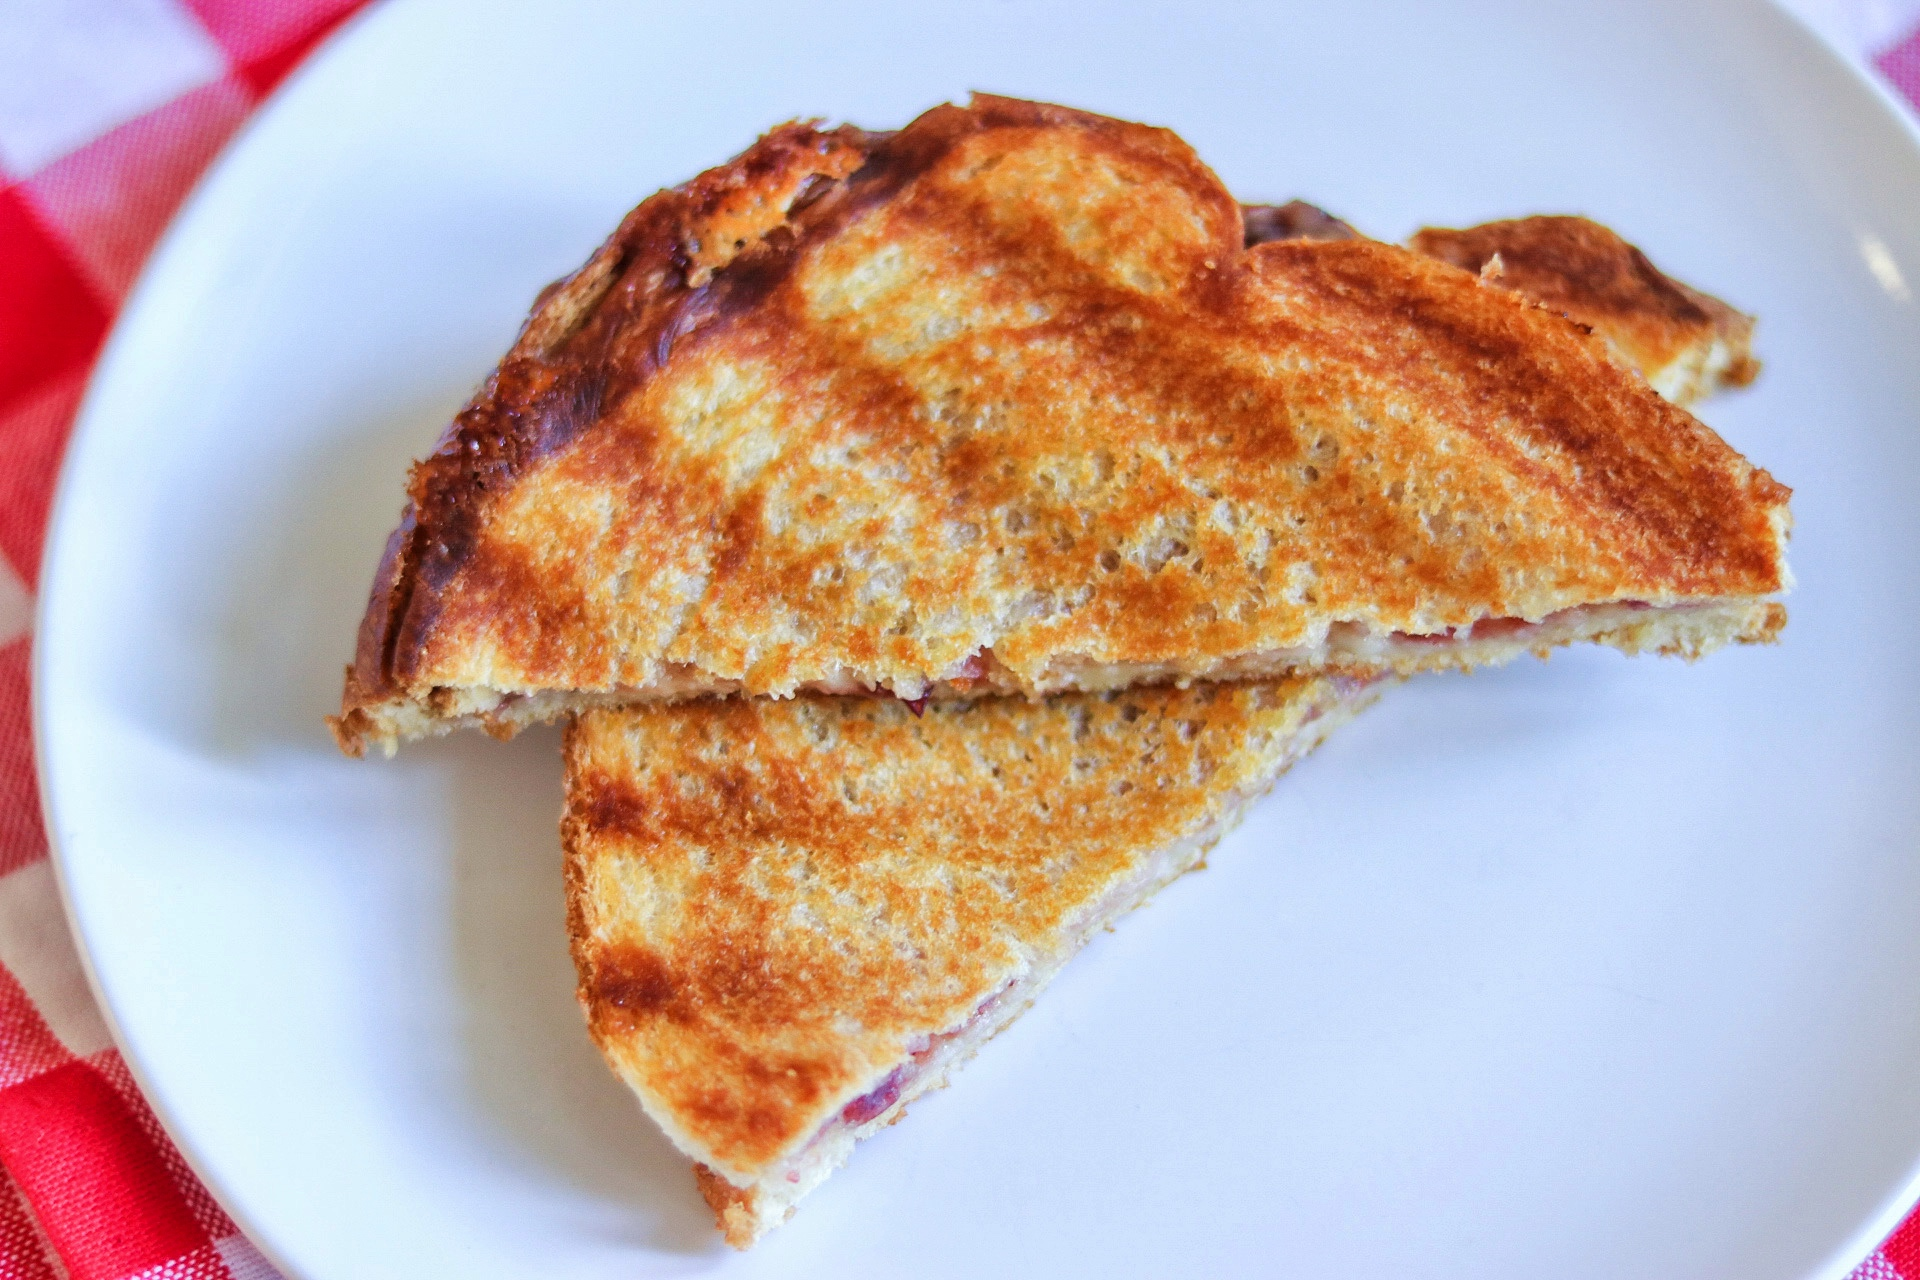 Grilled Camembert Sandwich